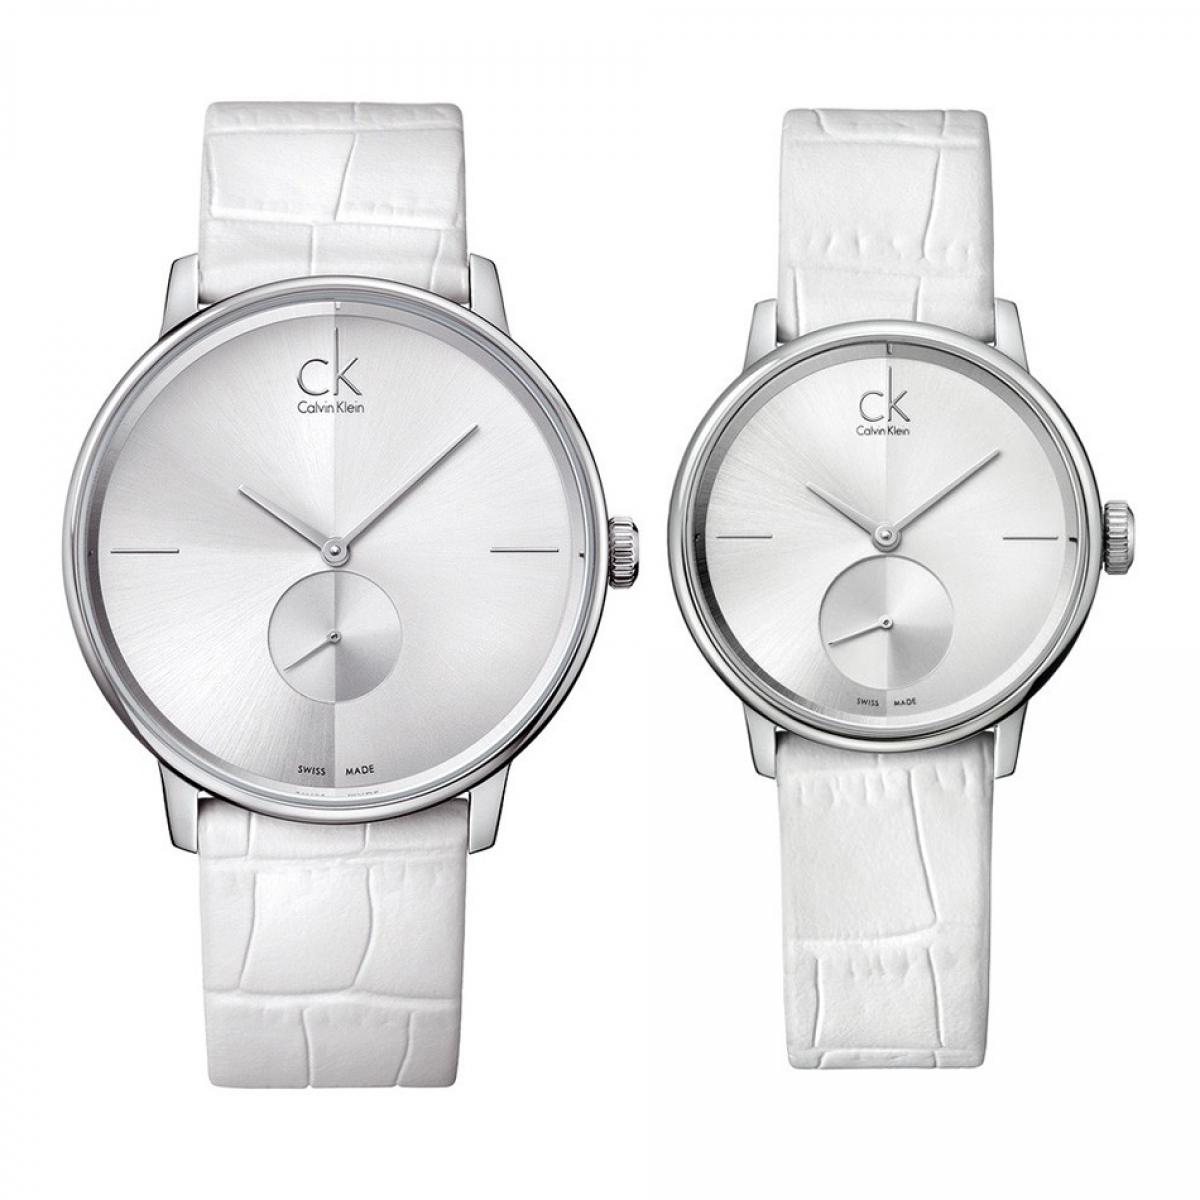 Комплект часовници за двойки Calvin Klein K2Y211K6 & K2Y231K6